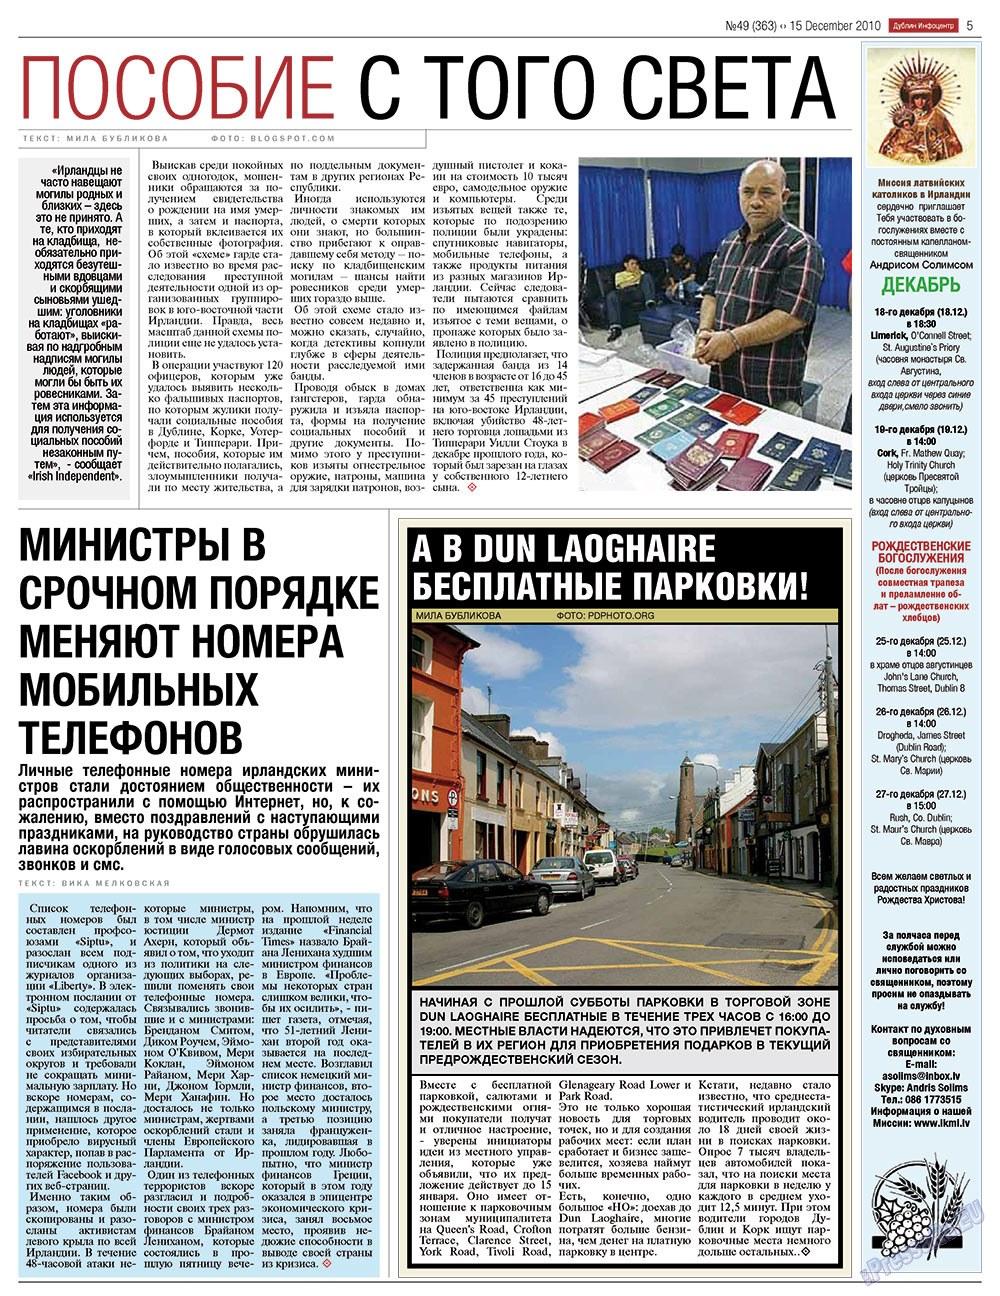 Дублин инфоцентр (газета). 2010 год, номер 49, стр. 5